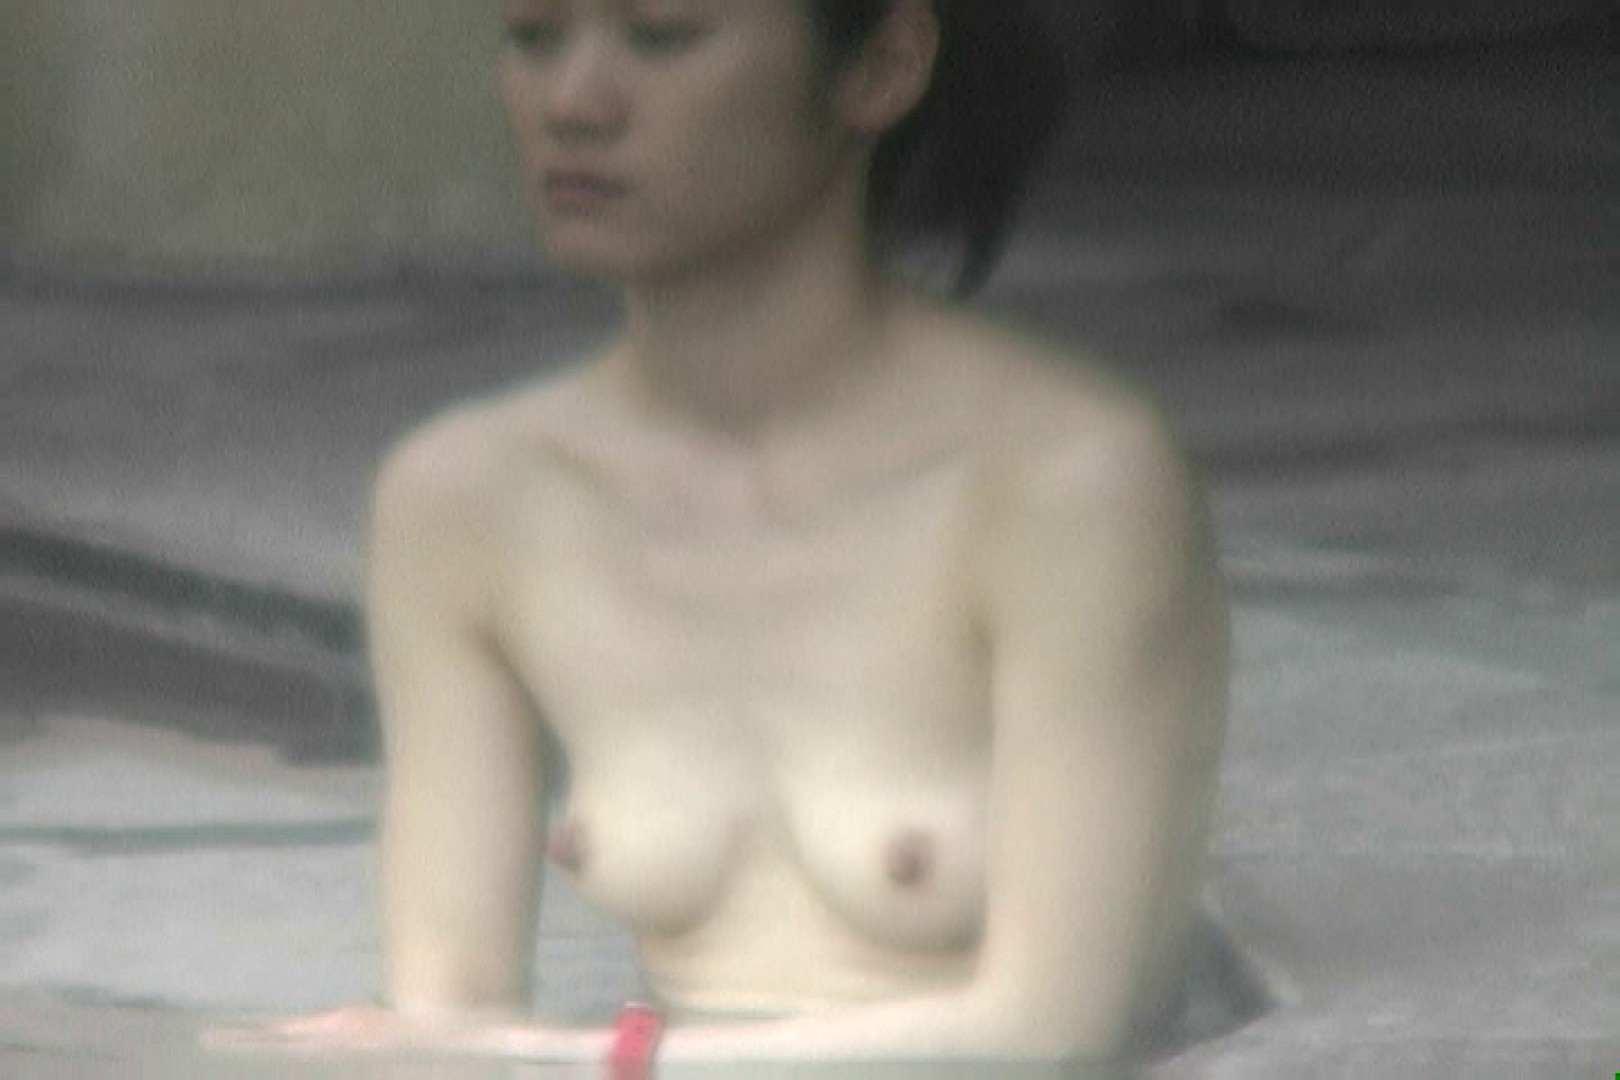 Aquaな露天風呂Vol.686 HなOL のぞき動画キャプチャ 83pic 22